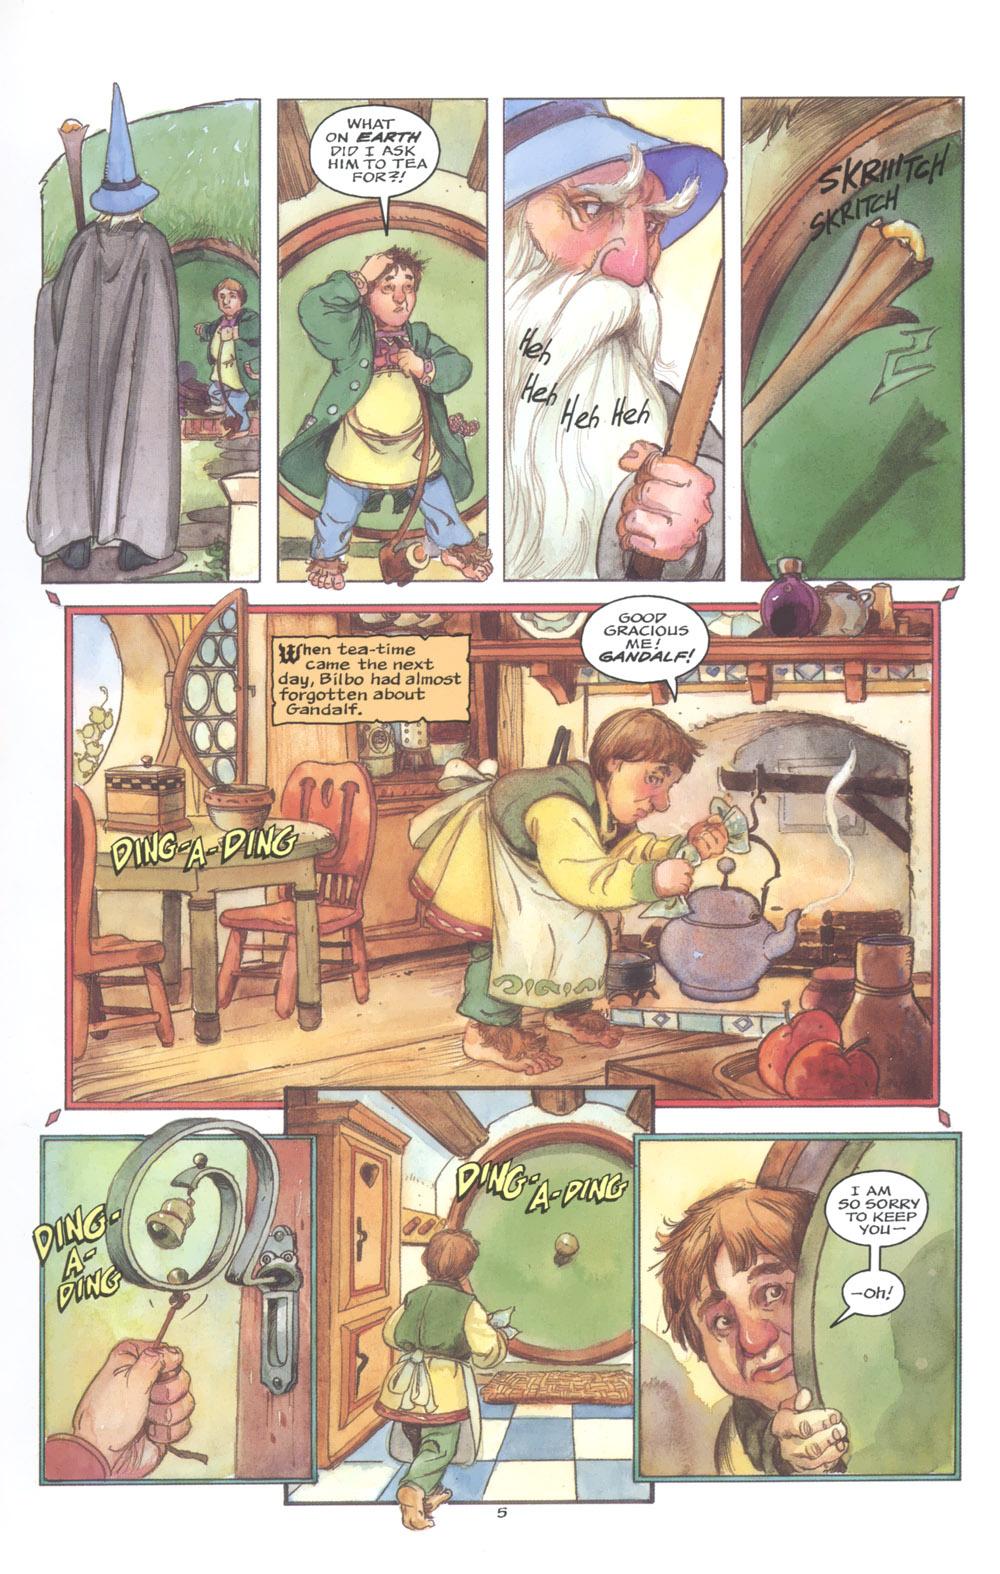 David Monogram. The hobbit 005